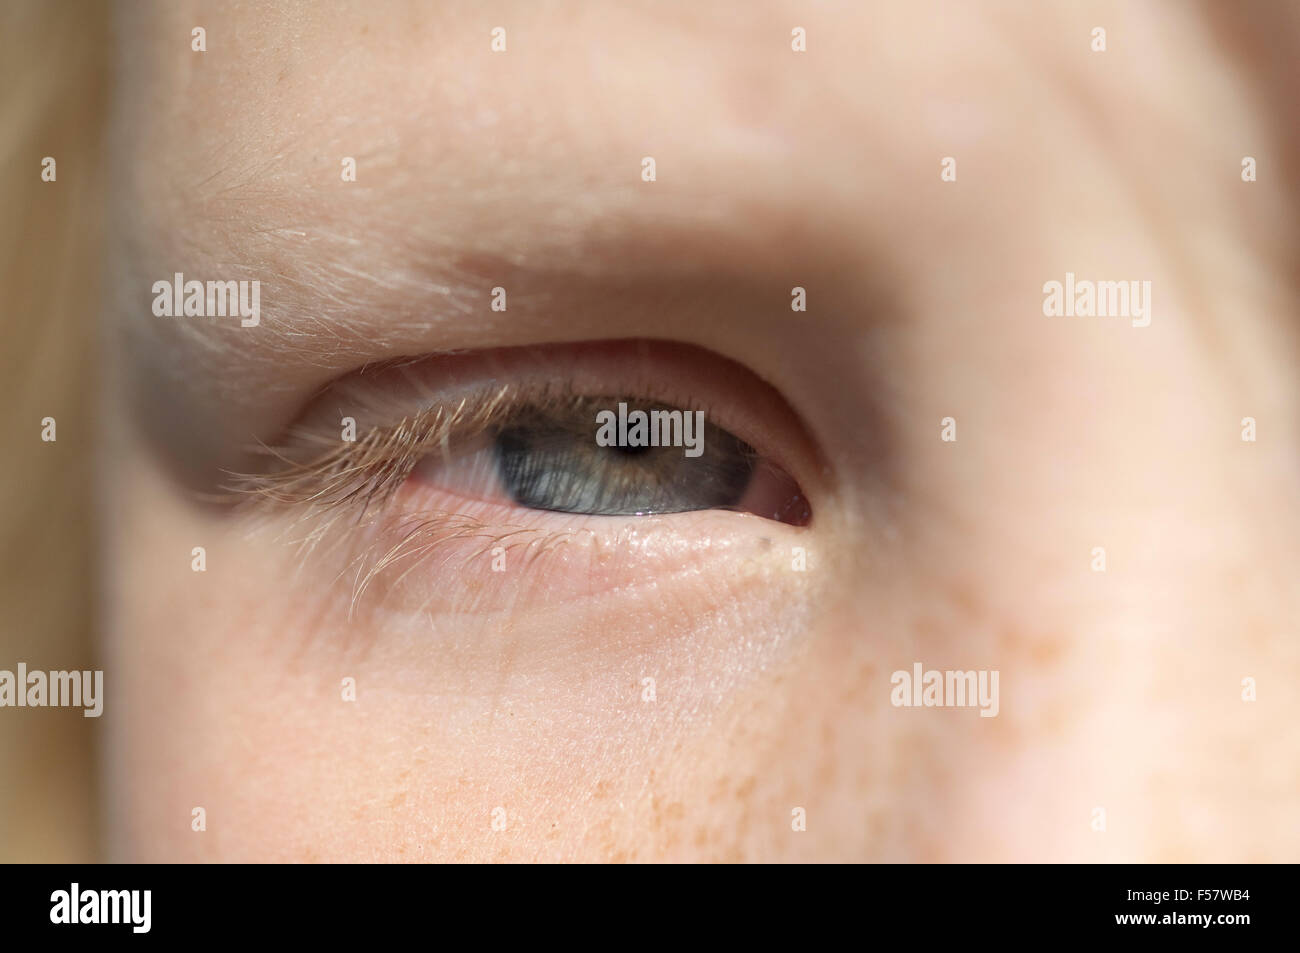 Blaugrau High Resolution Stock Photography And Images Alamy